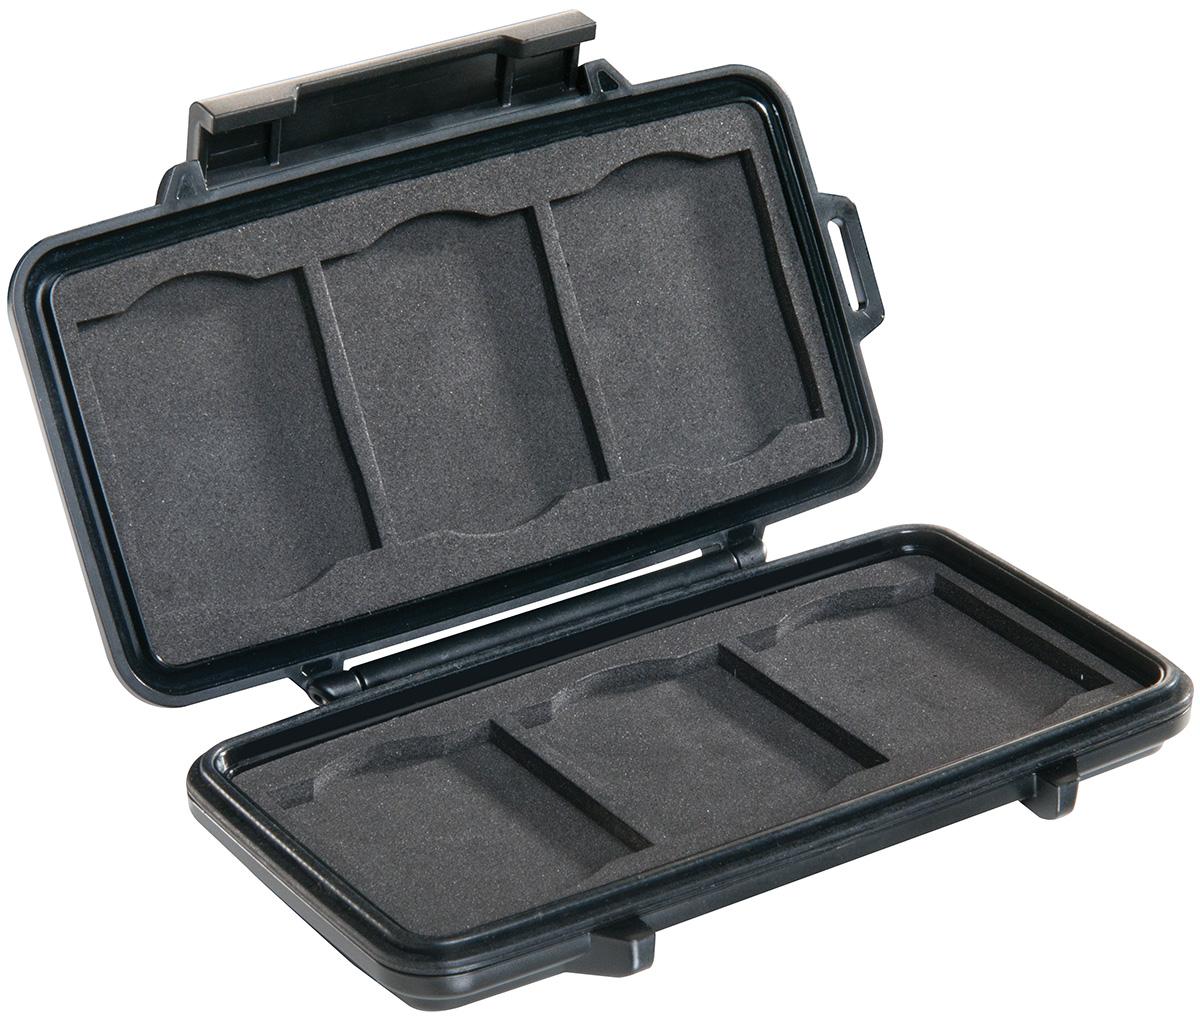 pelican waterproof camera compact flash case